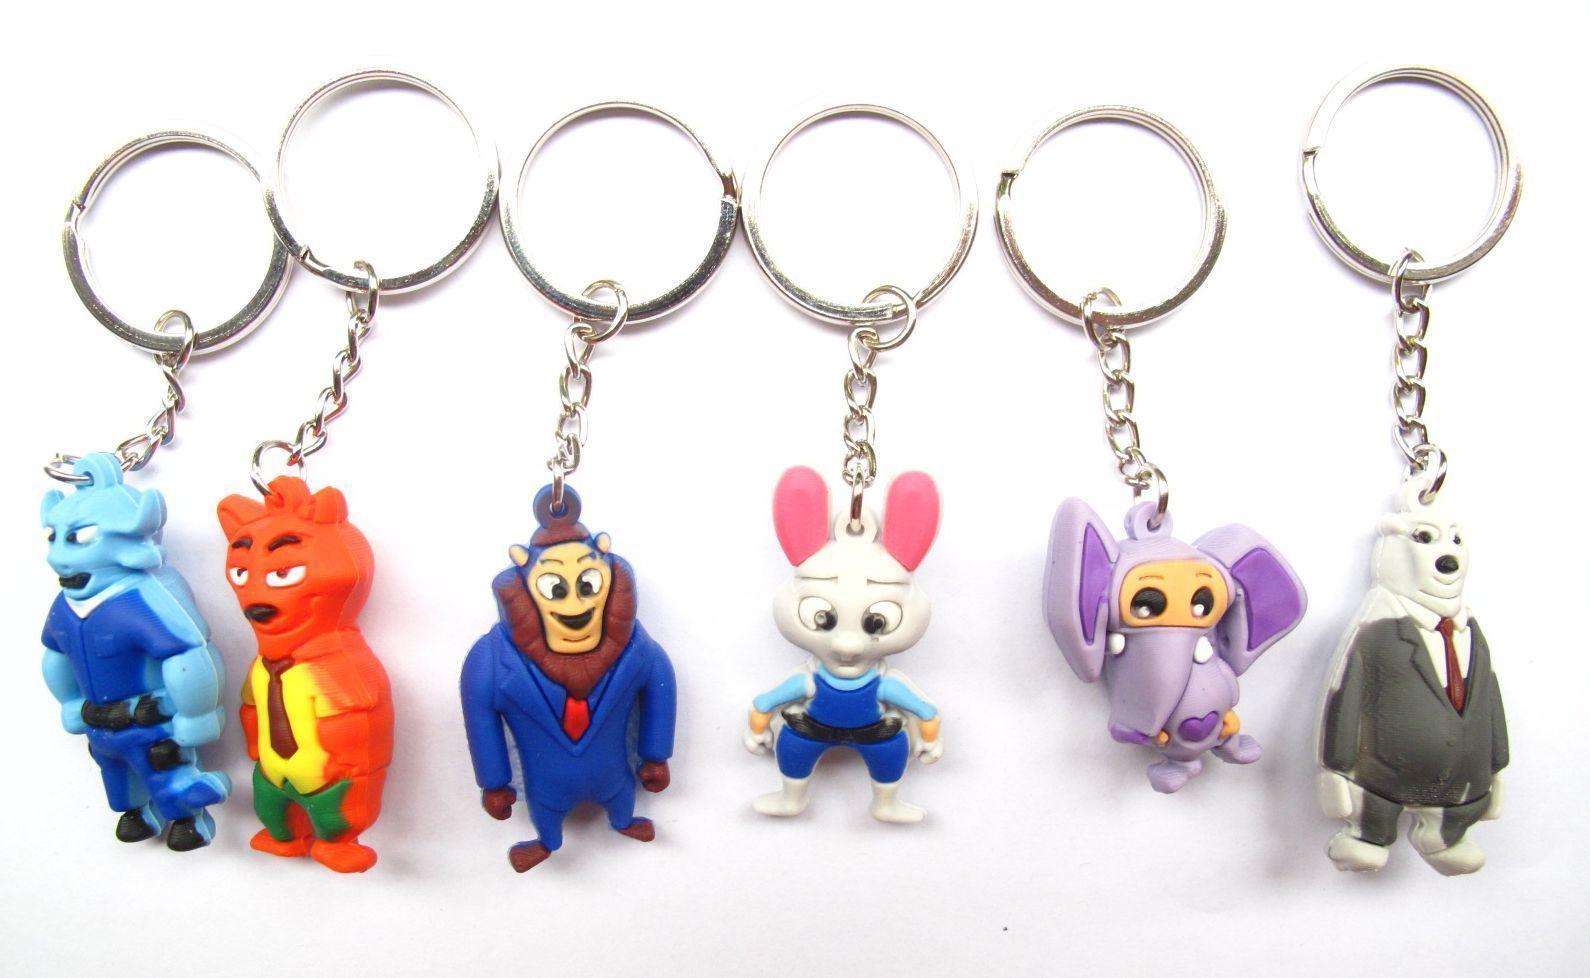 Toys cartoon images   Pcs D cartoon Zootopia animal mixed PVC Rubber Toys gift Key